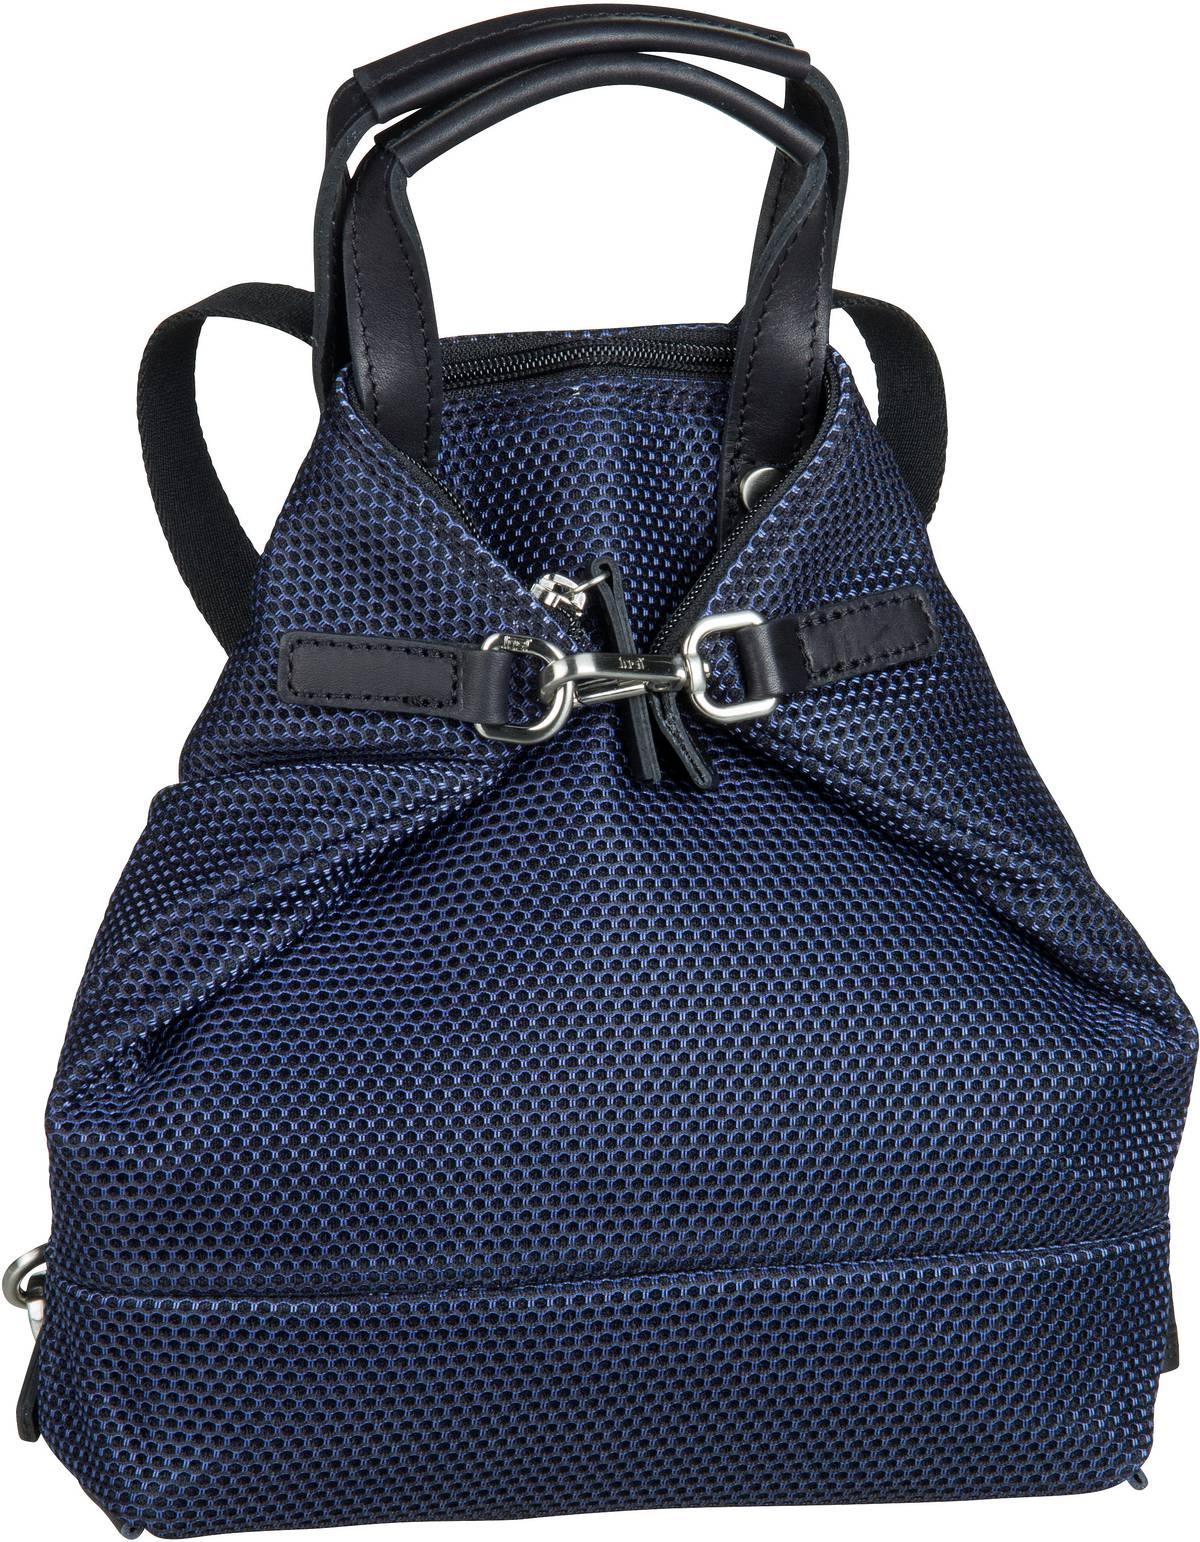 Rucksack / Daypack Mesh 6176 X-Change Bag Mini Blue